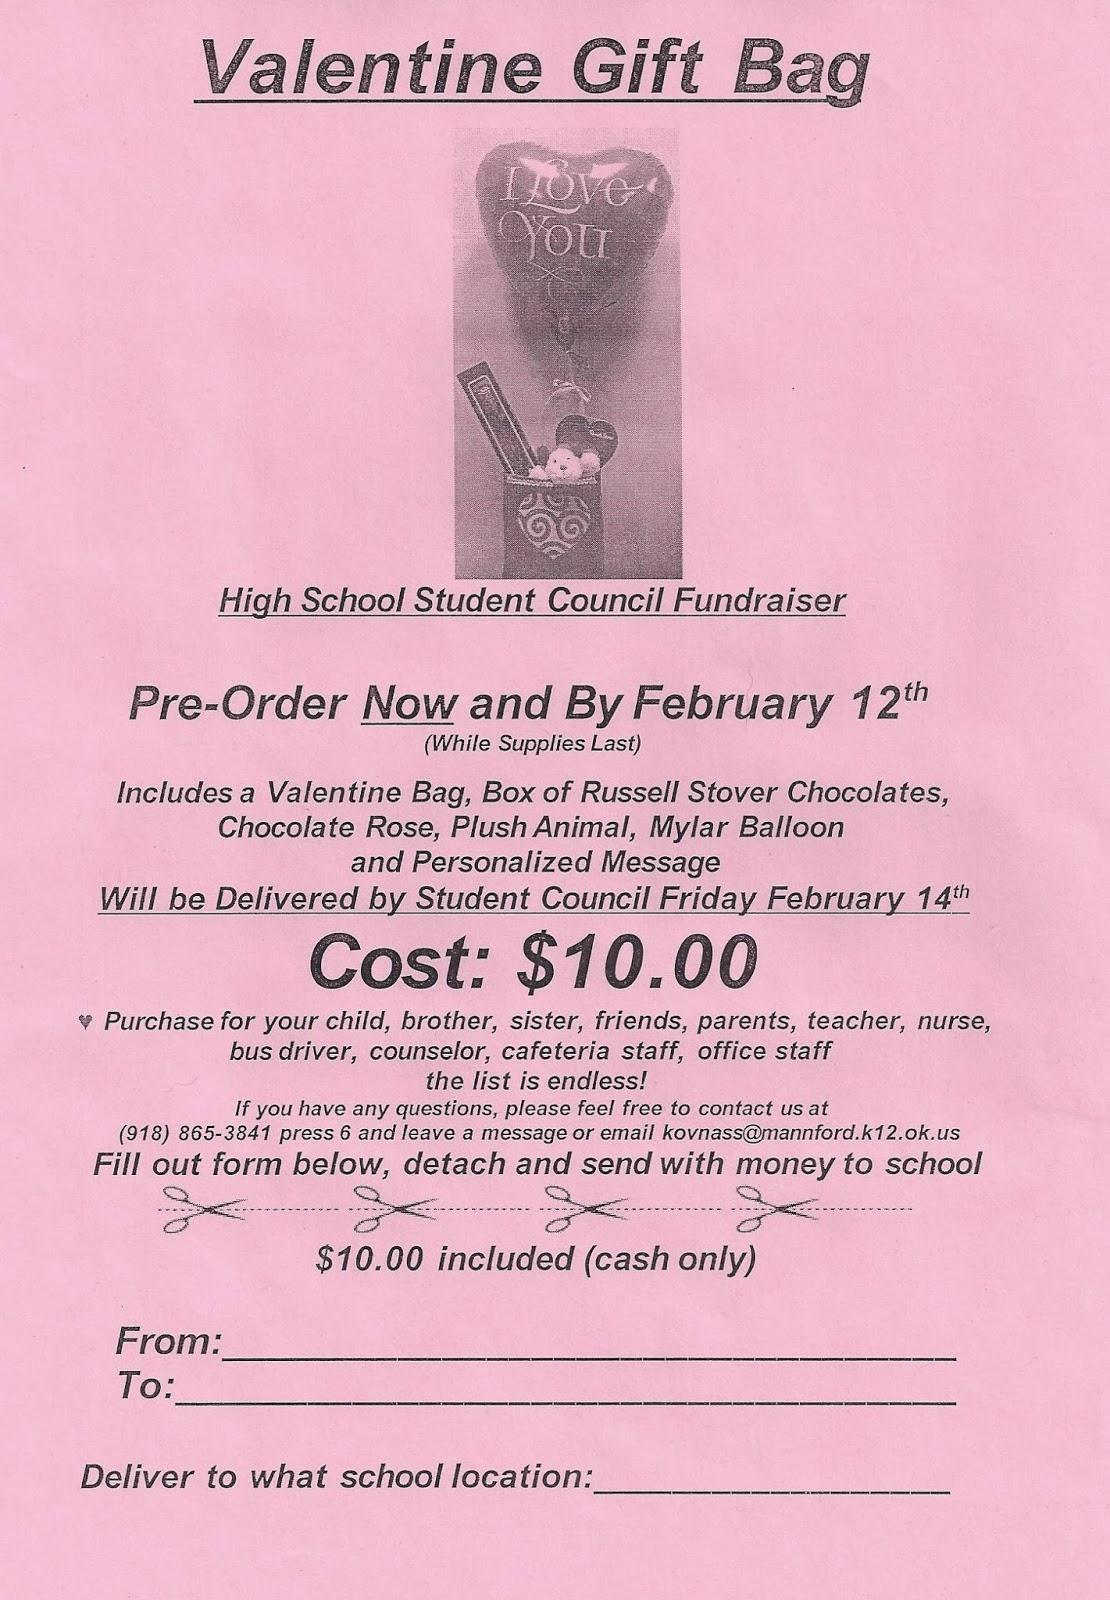 candy gram school fundraiser template | just b.CAUSE